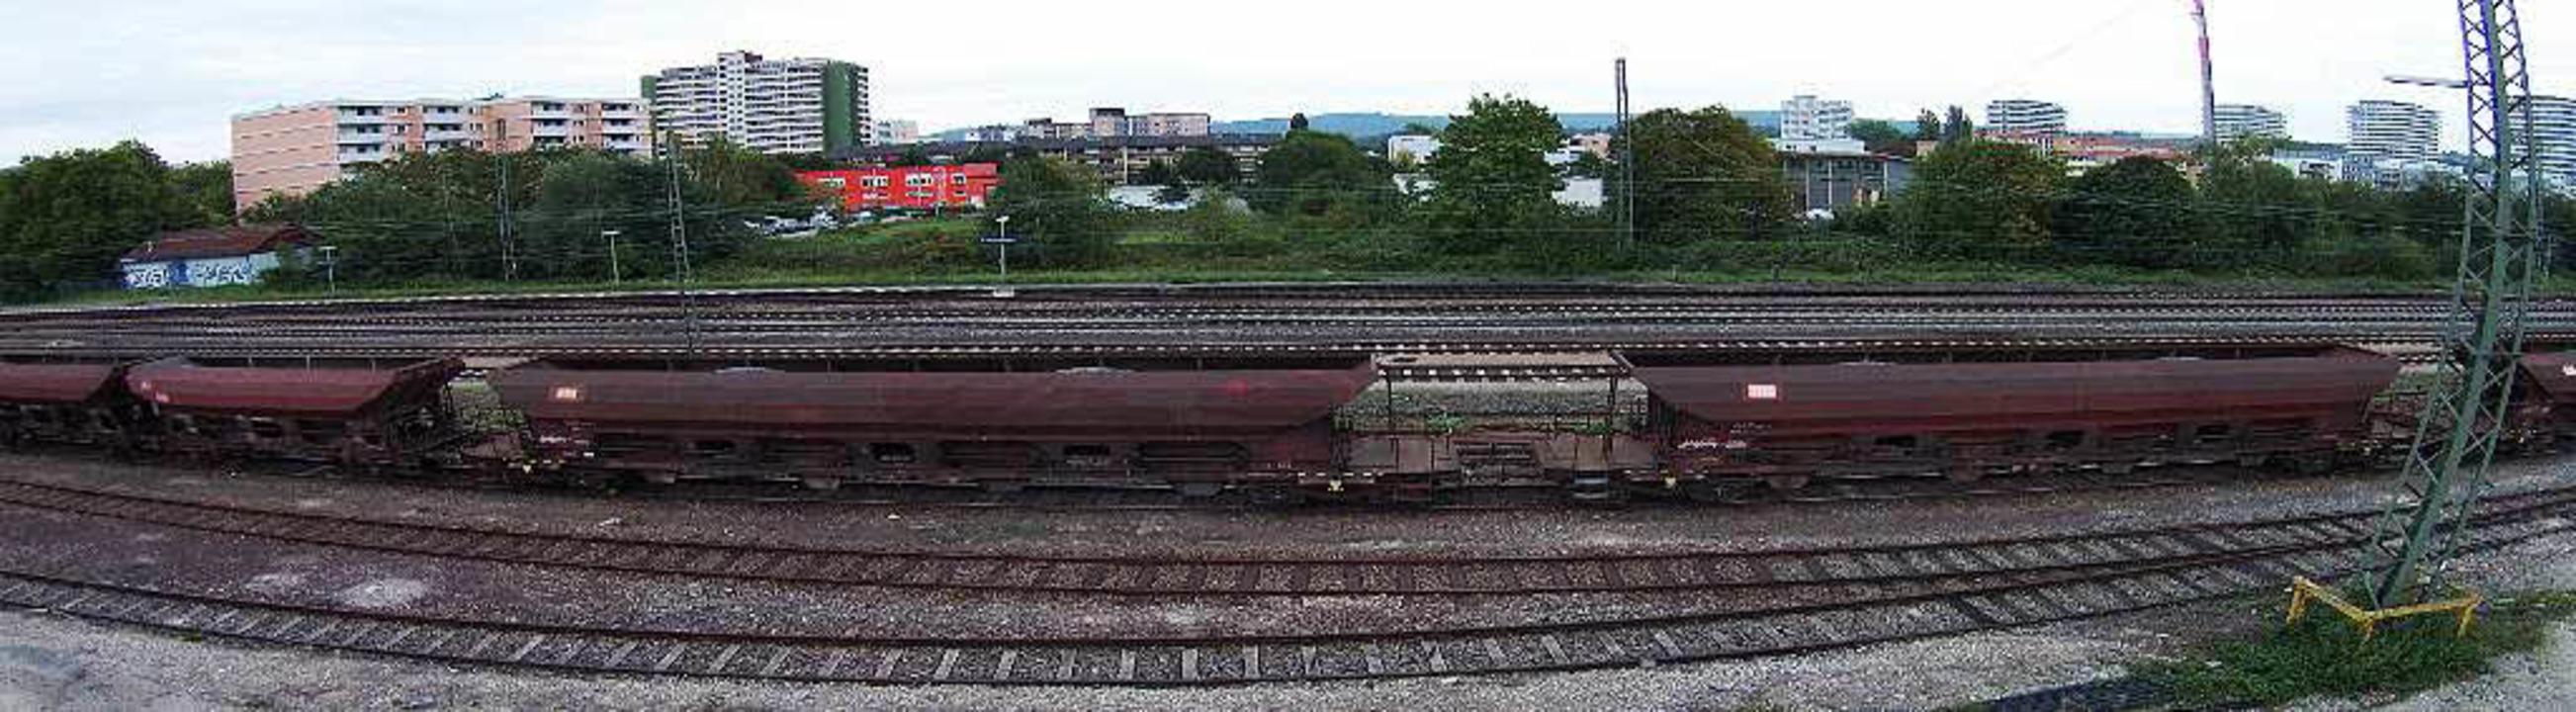 Bahn an die  Autobahn, fordert auch Lahr.  | Foto: Christoph Breithaupt